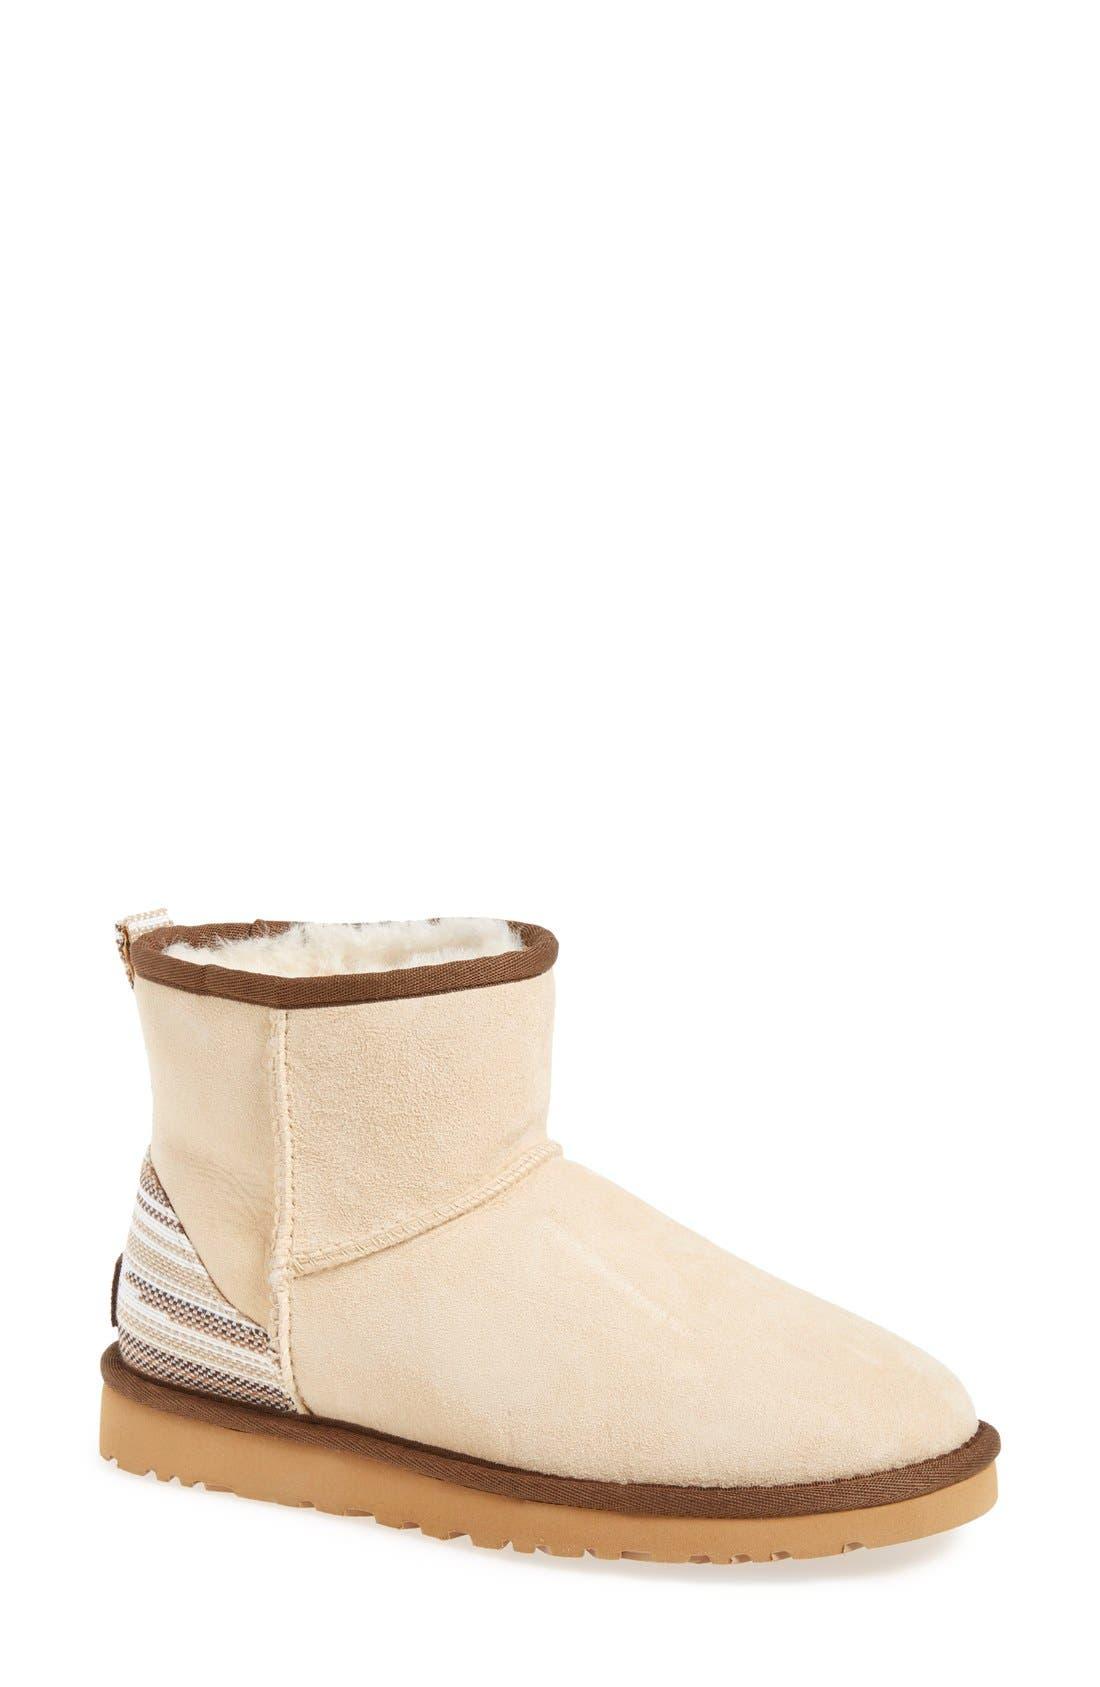 Alternate Image 1 Selected - UGG® 'Classic Mini Serape' Genuine Shearling Lined Boot (Women)